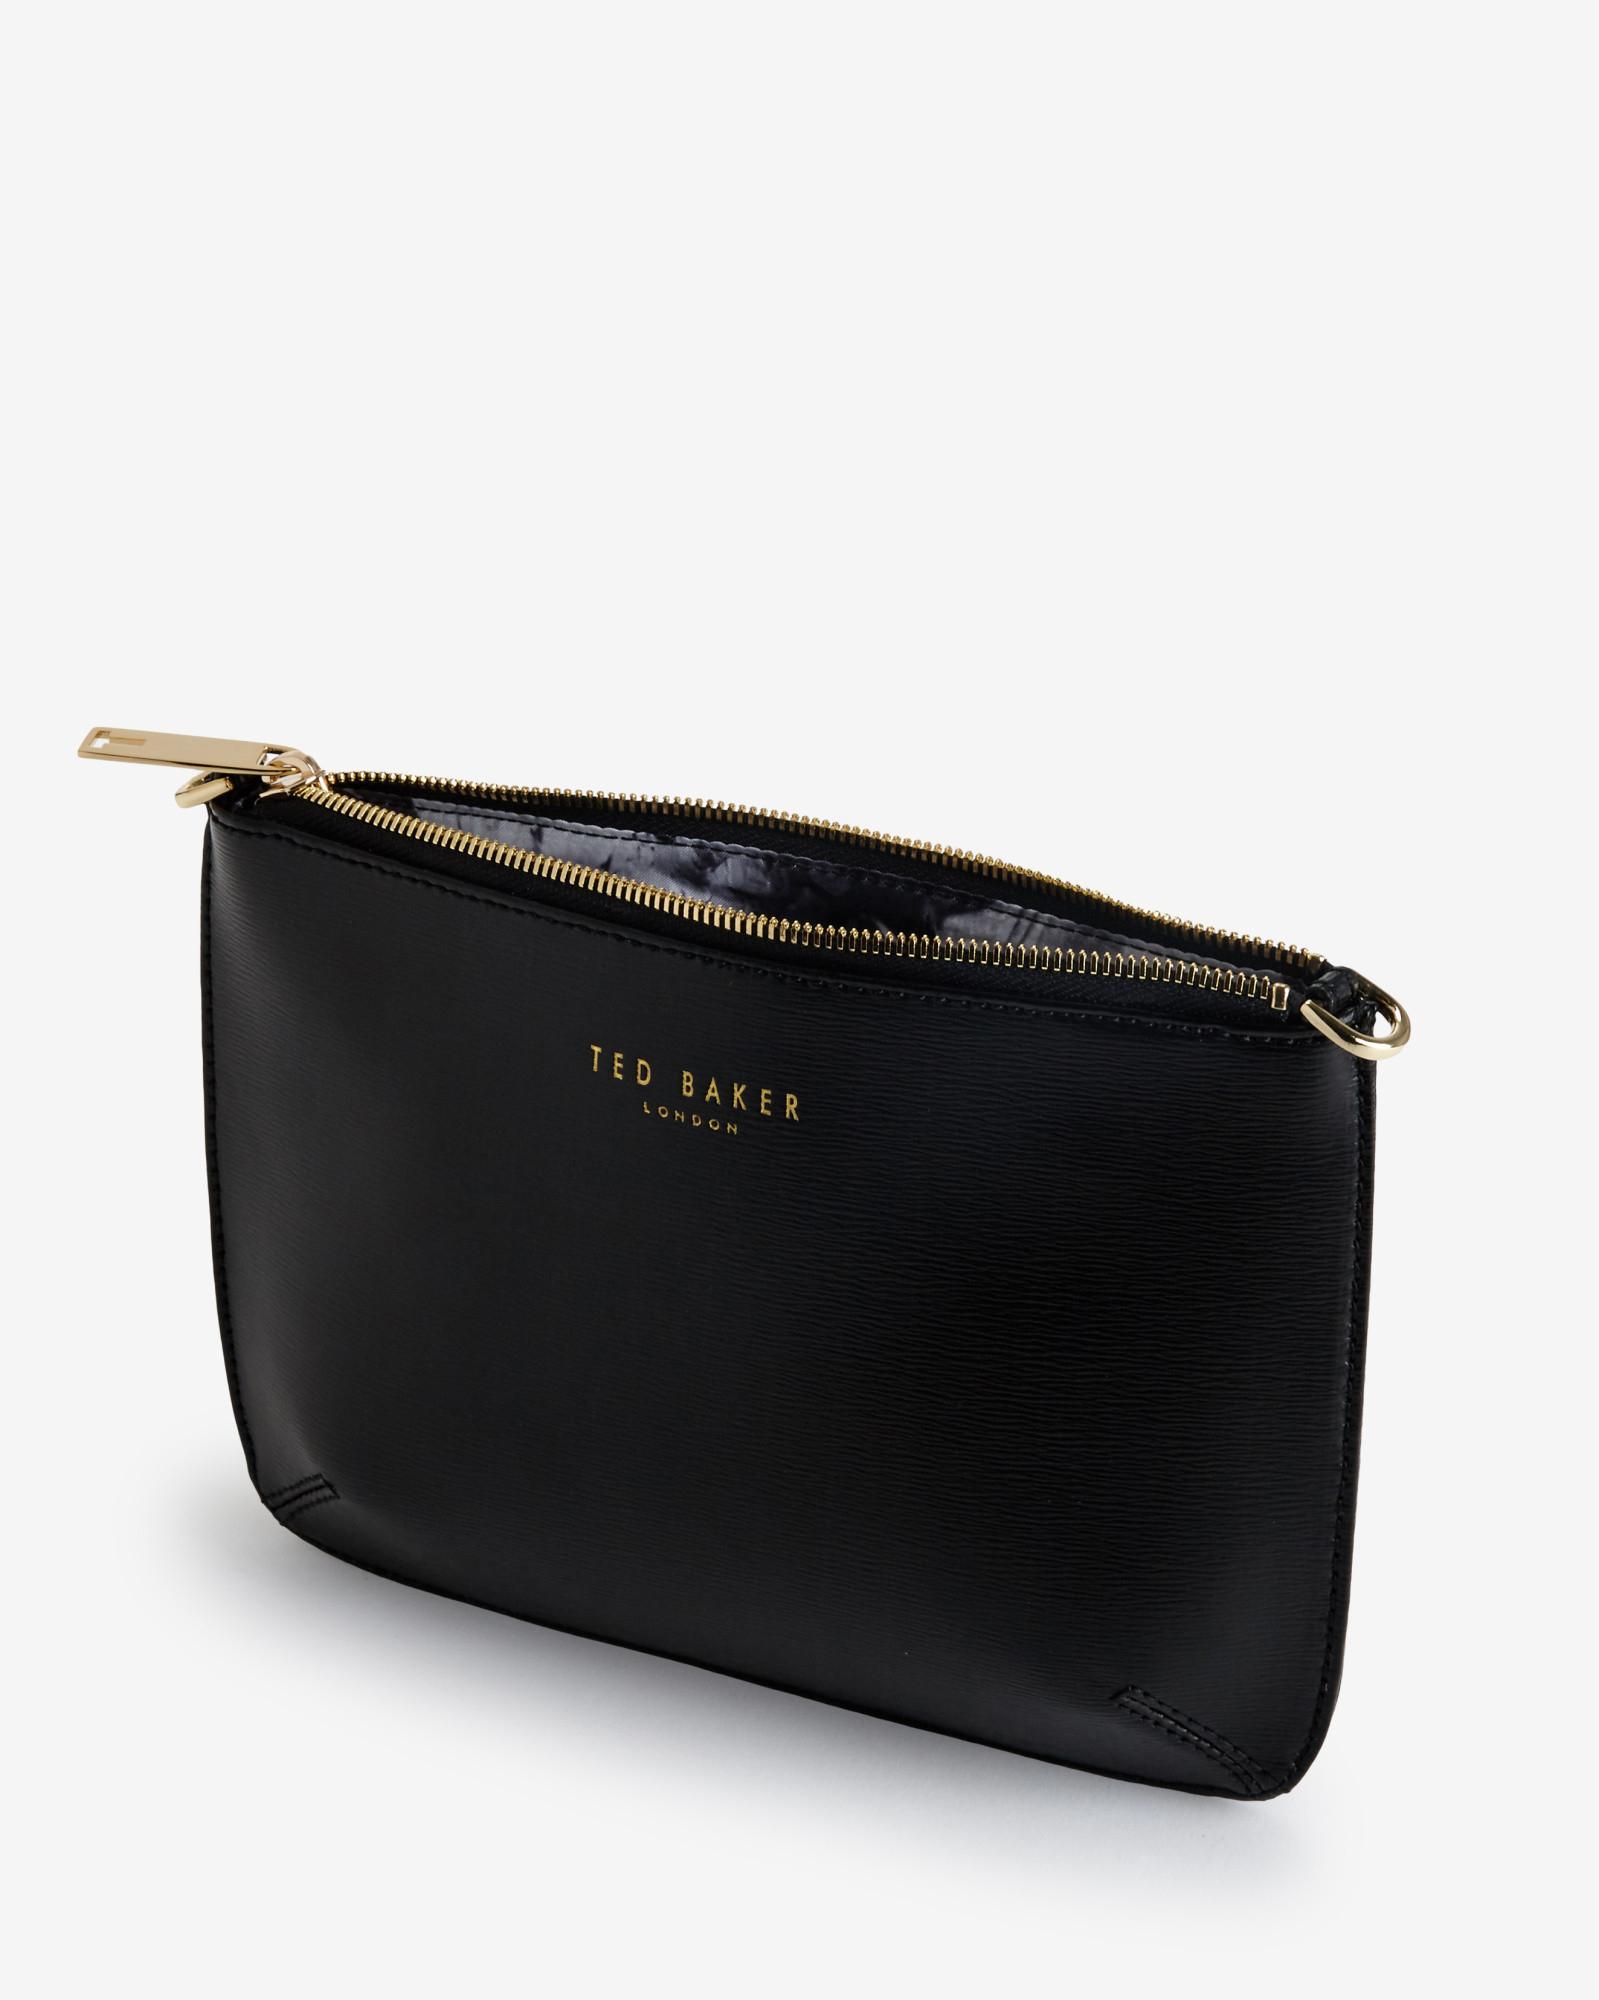 a10a3d7e22c60 Lyst - Ted Baker Crosshatch Clutch Bag in Black